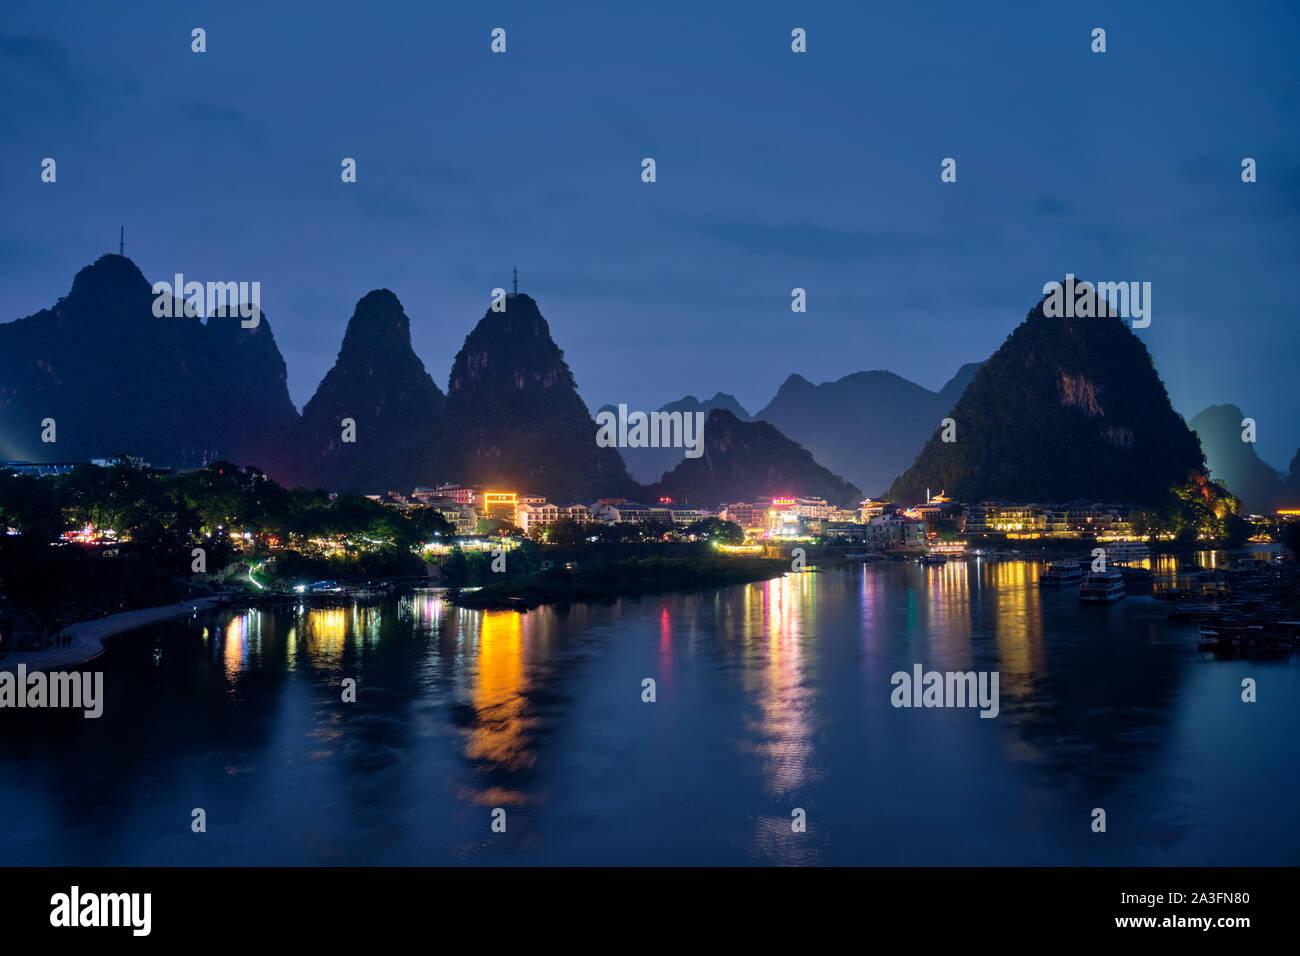 Yangshuo town illuminated in the evening, China Stock Photo